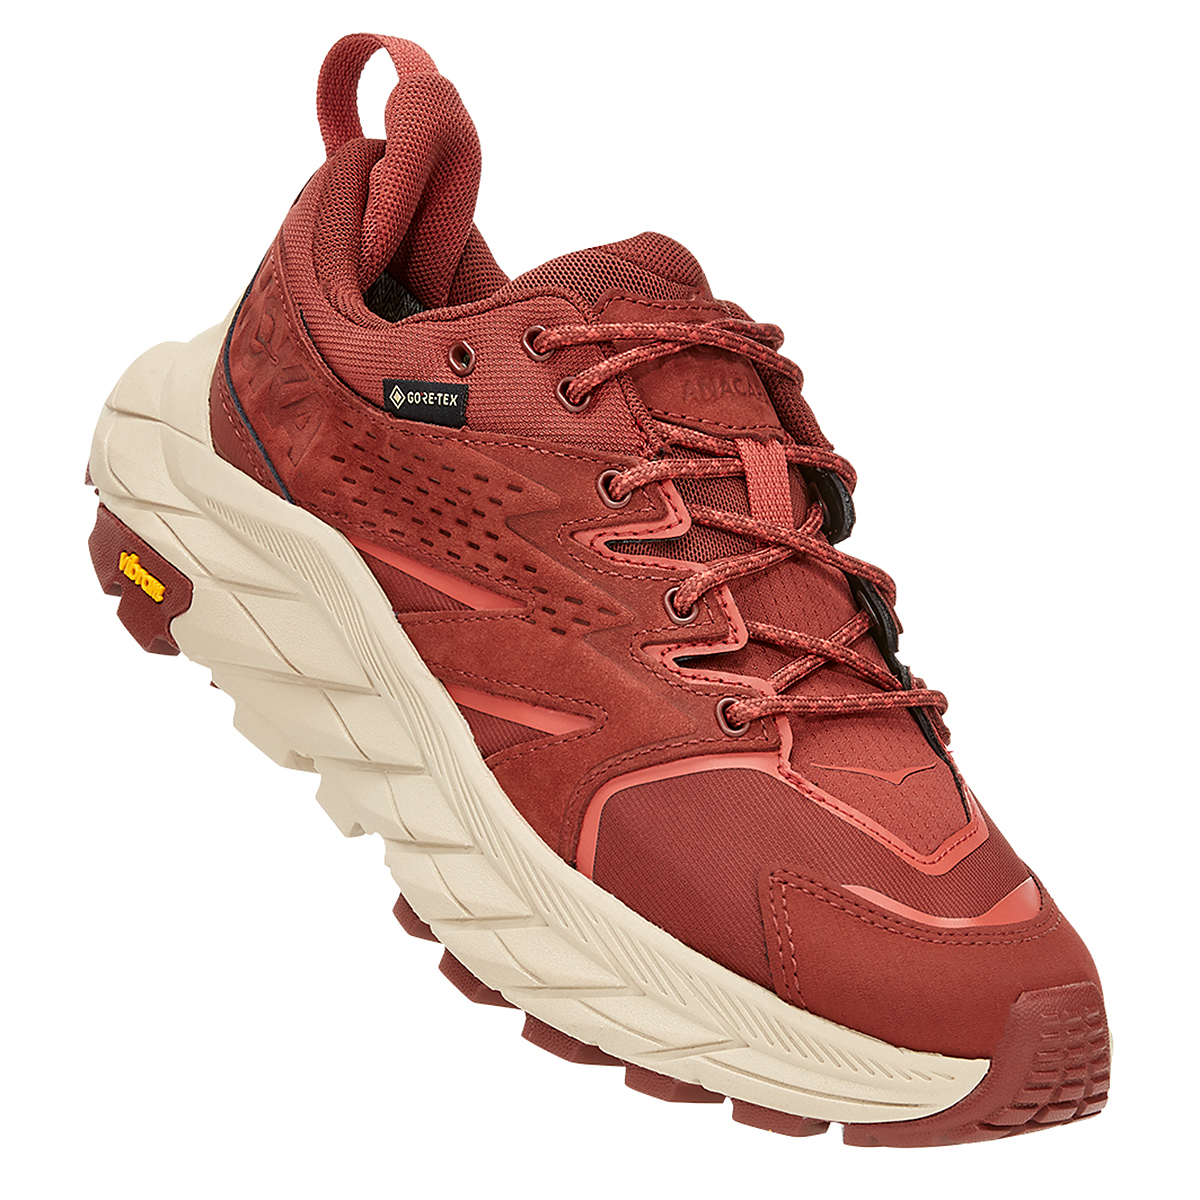 Women's Hoka One One Anacapa Low Gore-Tex Trail Running Shoe - Color: Cherry Mahogany - Size: 5 - Width: Regular, Cherry Mahogany, large, image 2